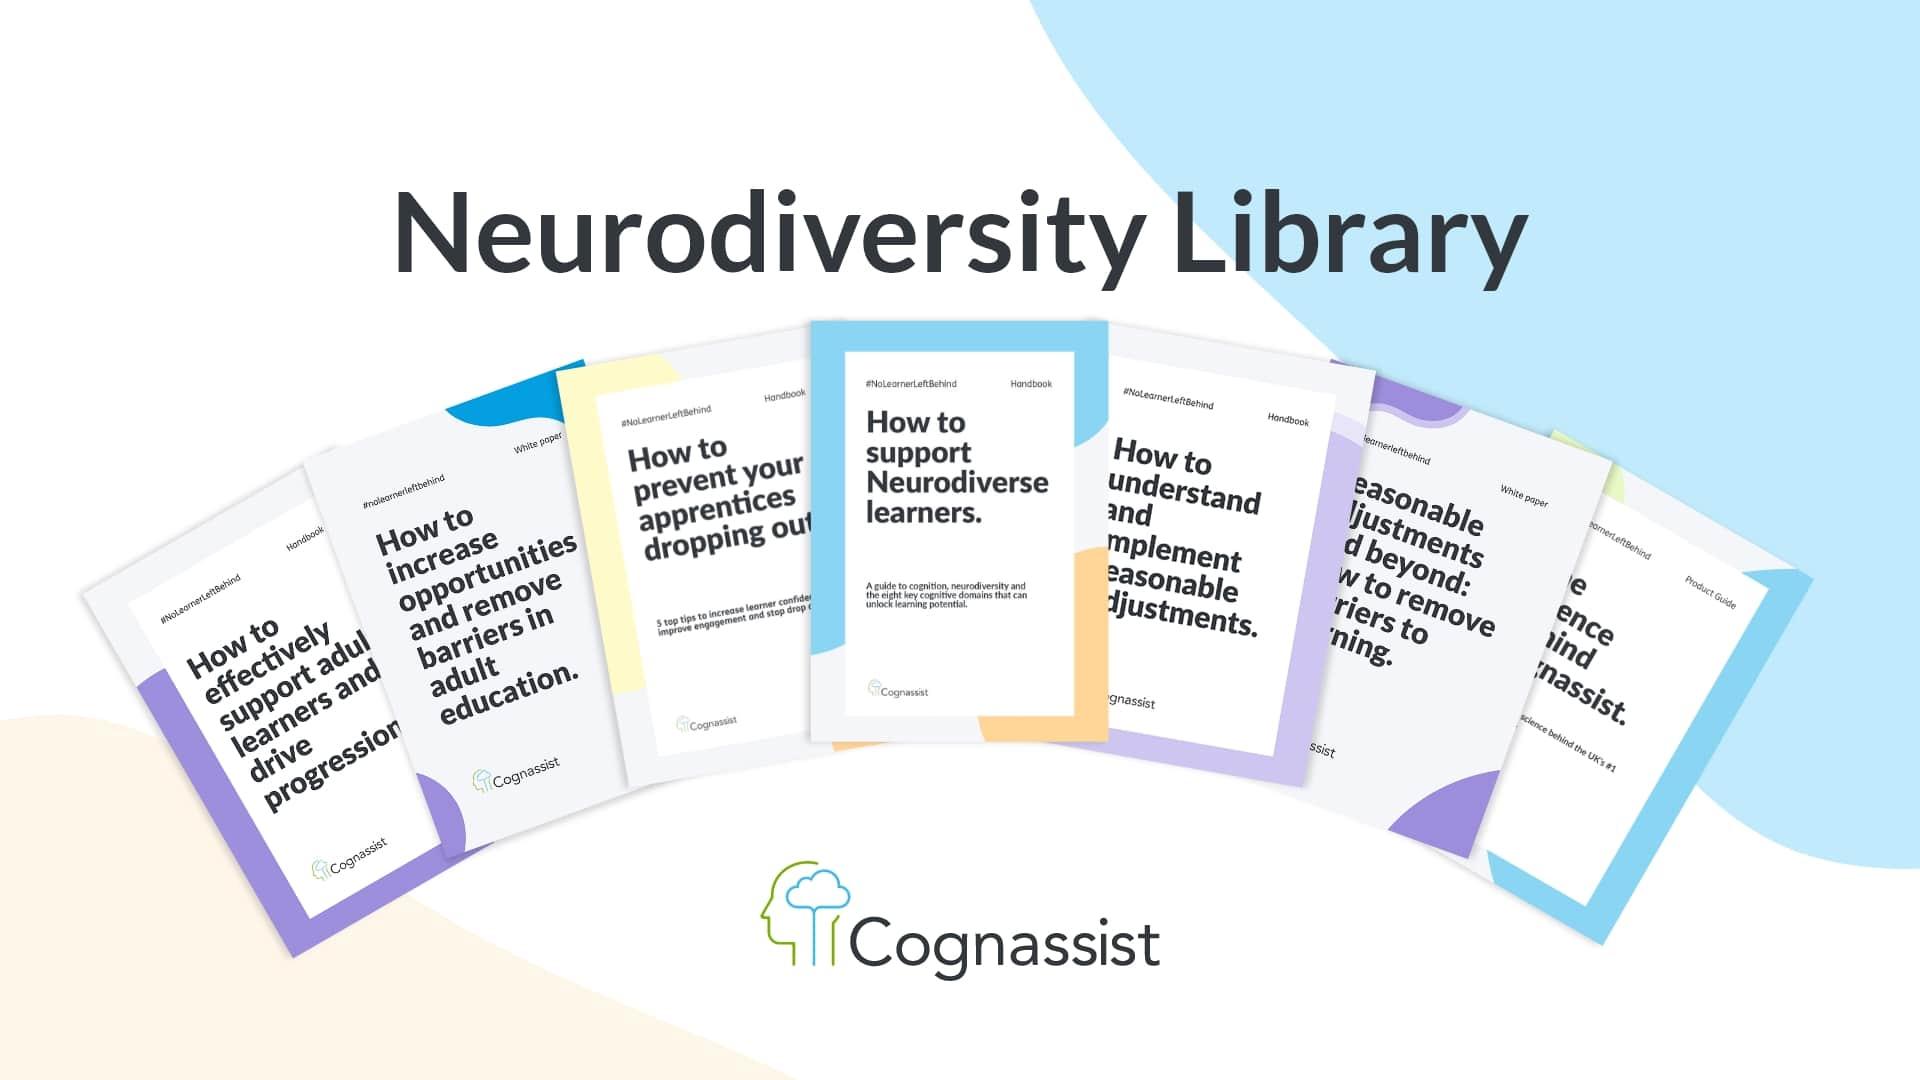 Neurodiversity library